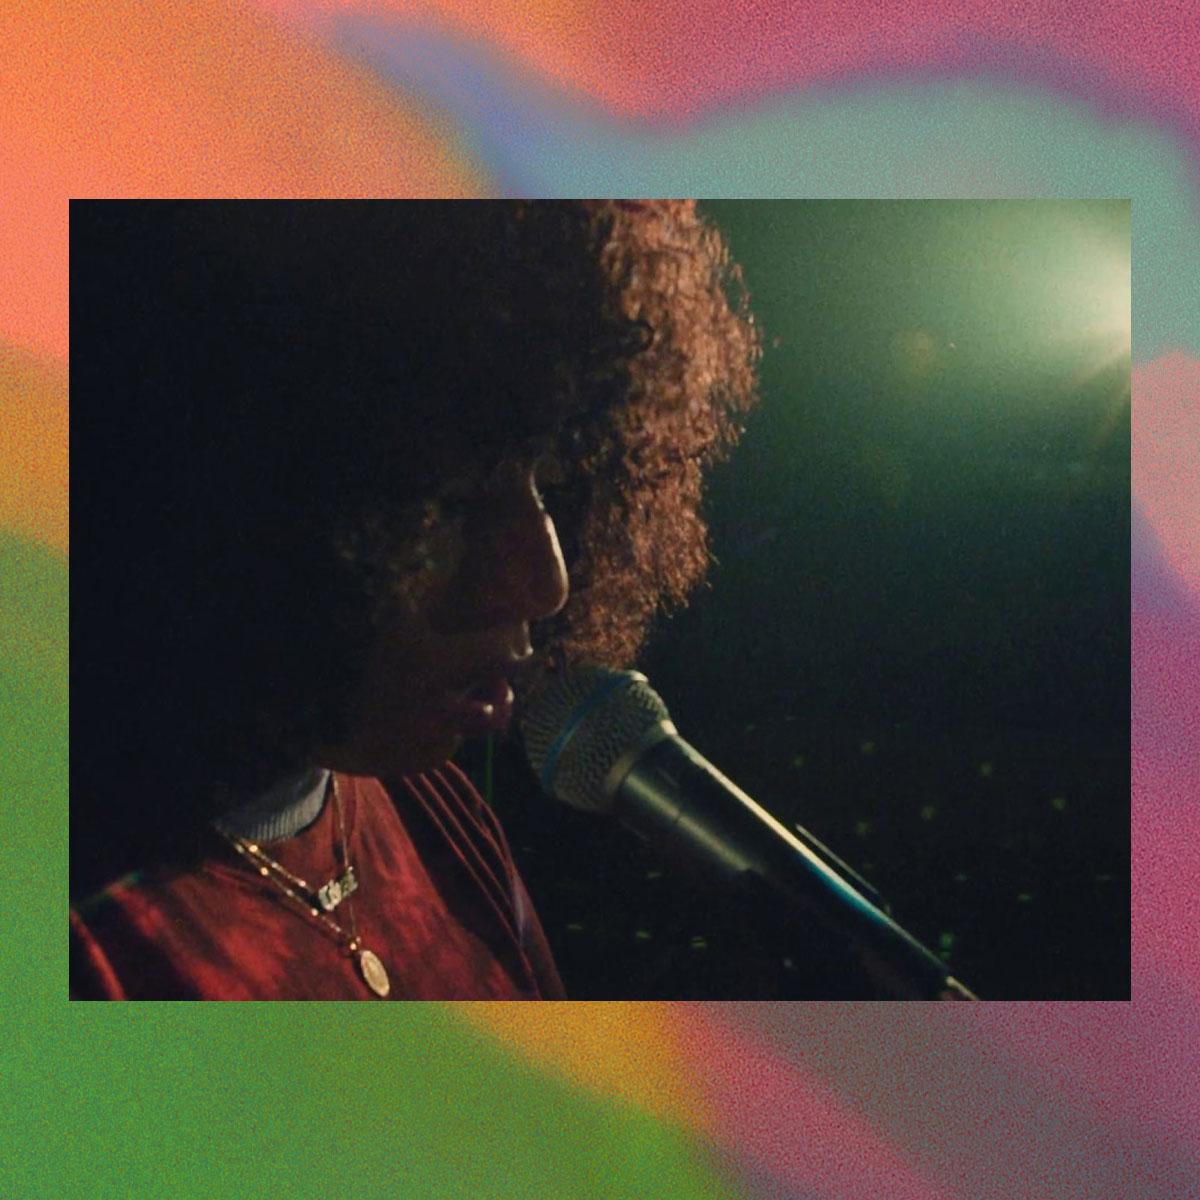 SG Lewis' Sad Soul Songs (Celeste)